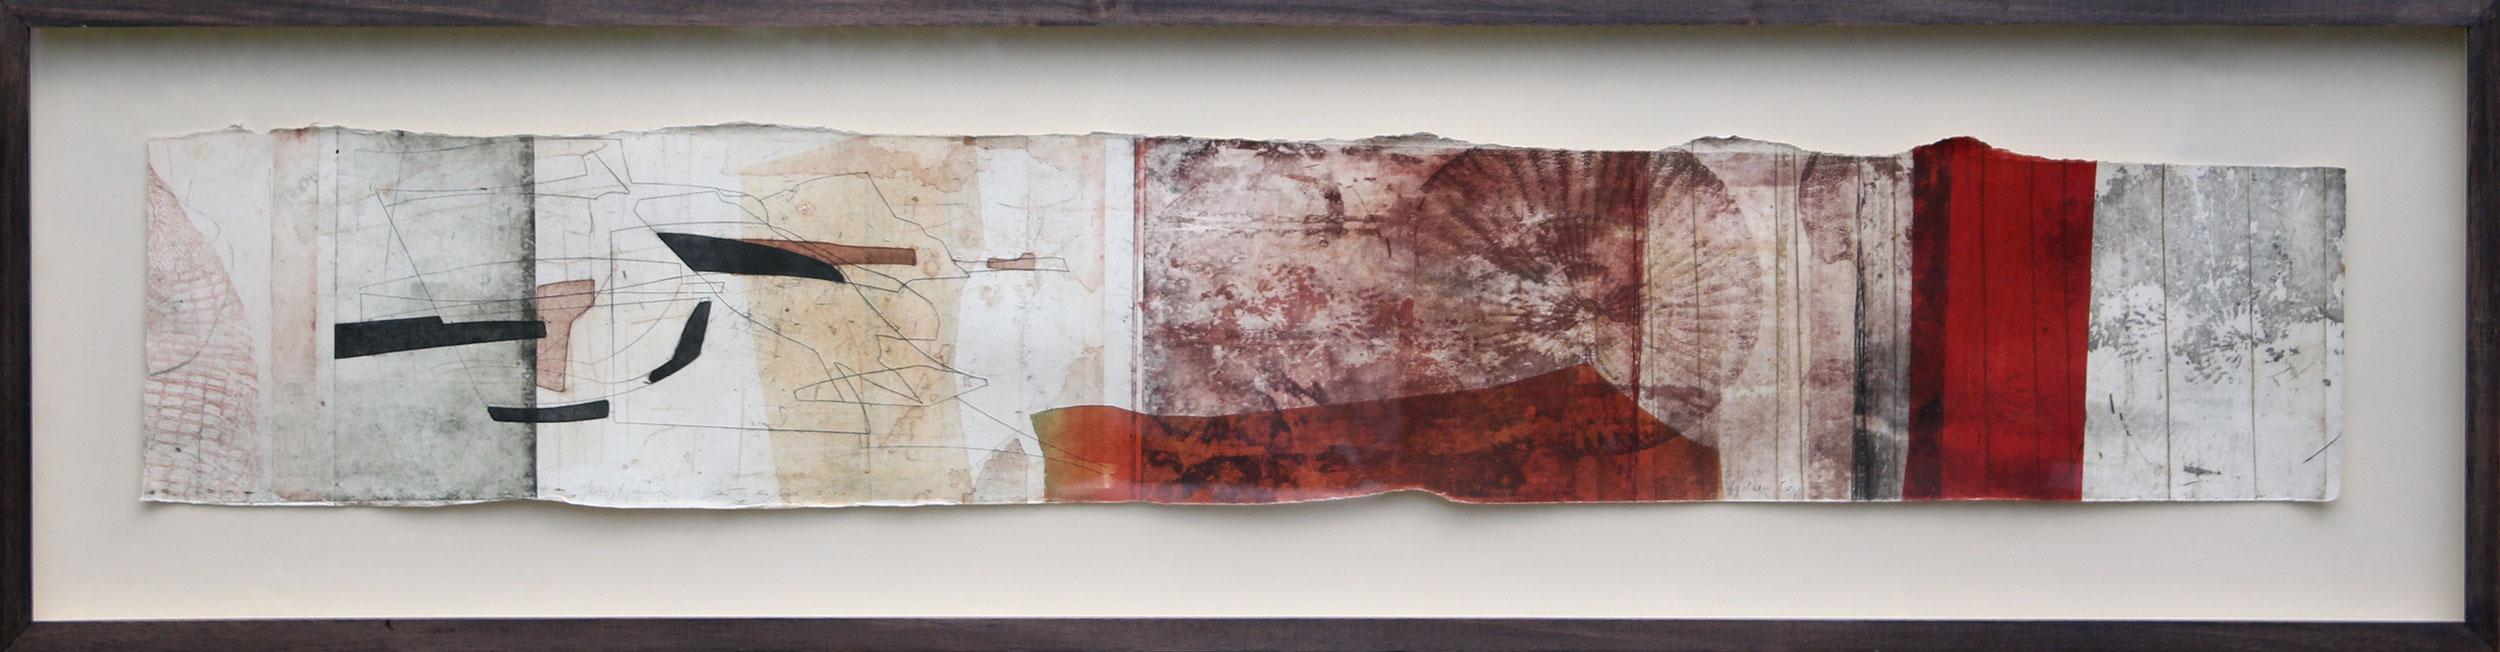 Golden Cap, Dorset, 2009, Intaglio Monoprint by Jeremy Gardiner